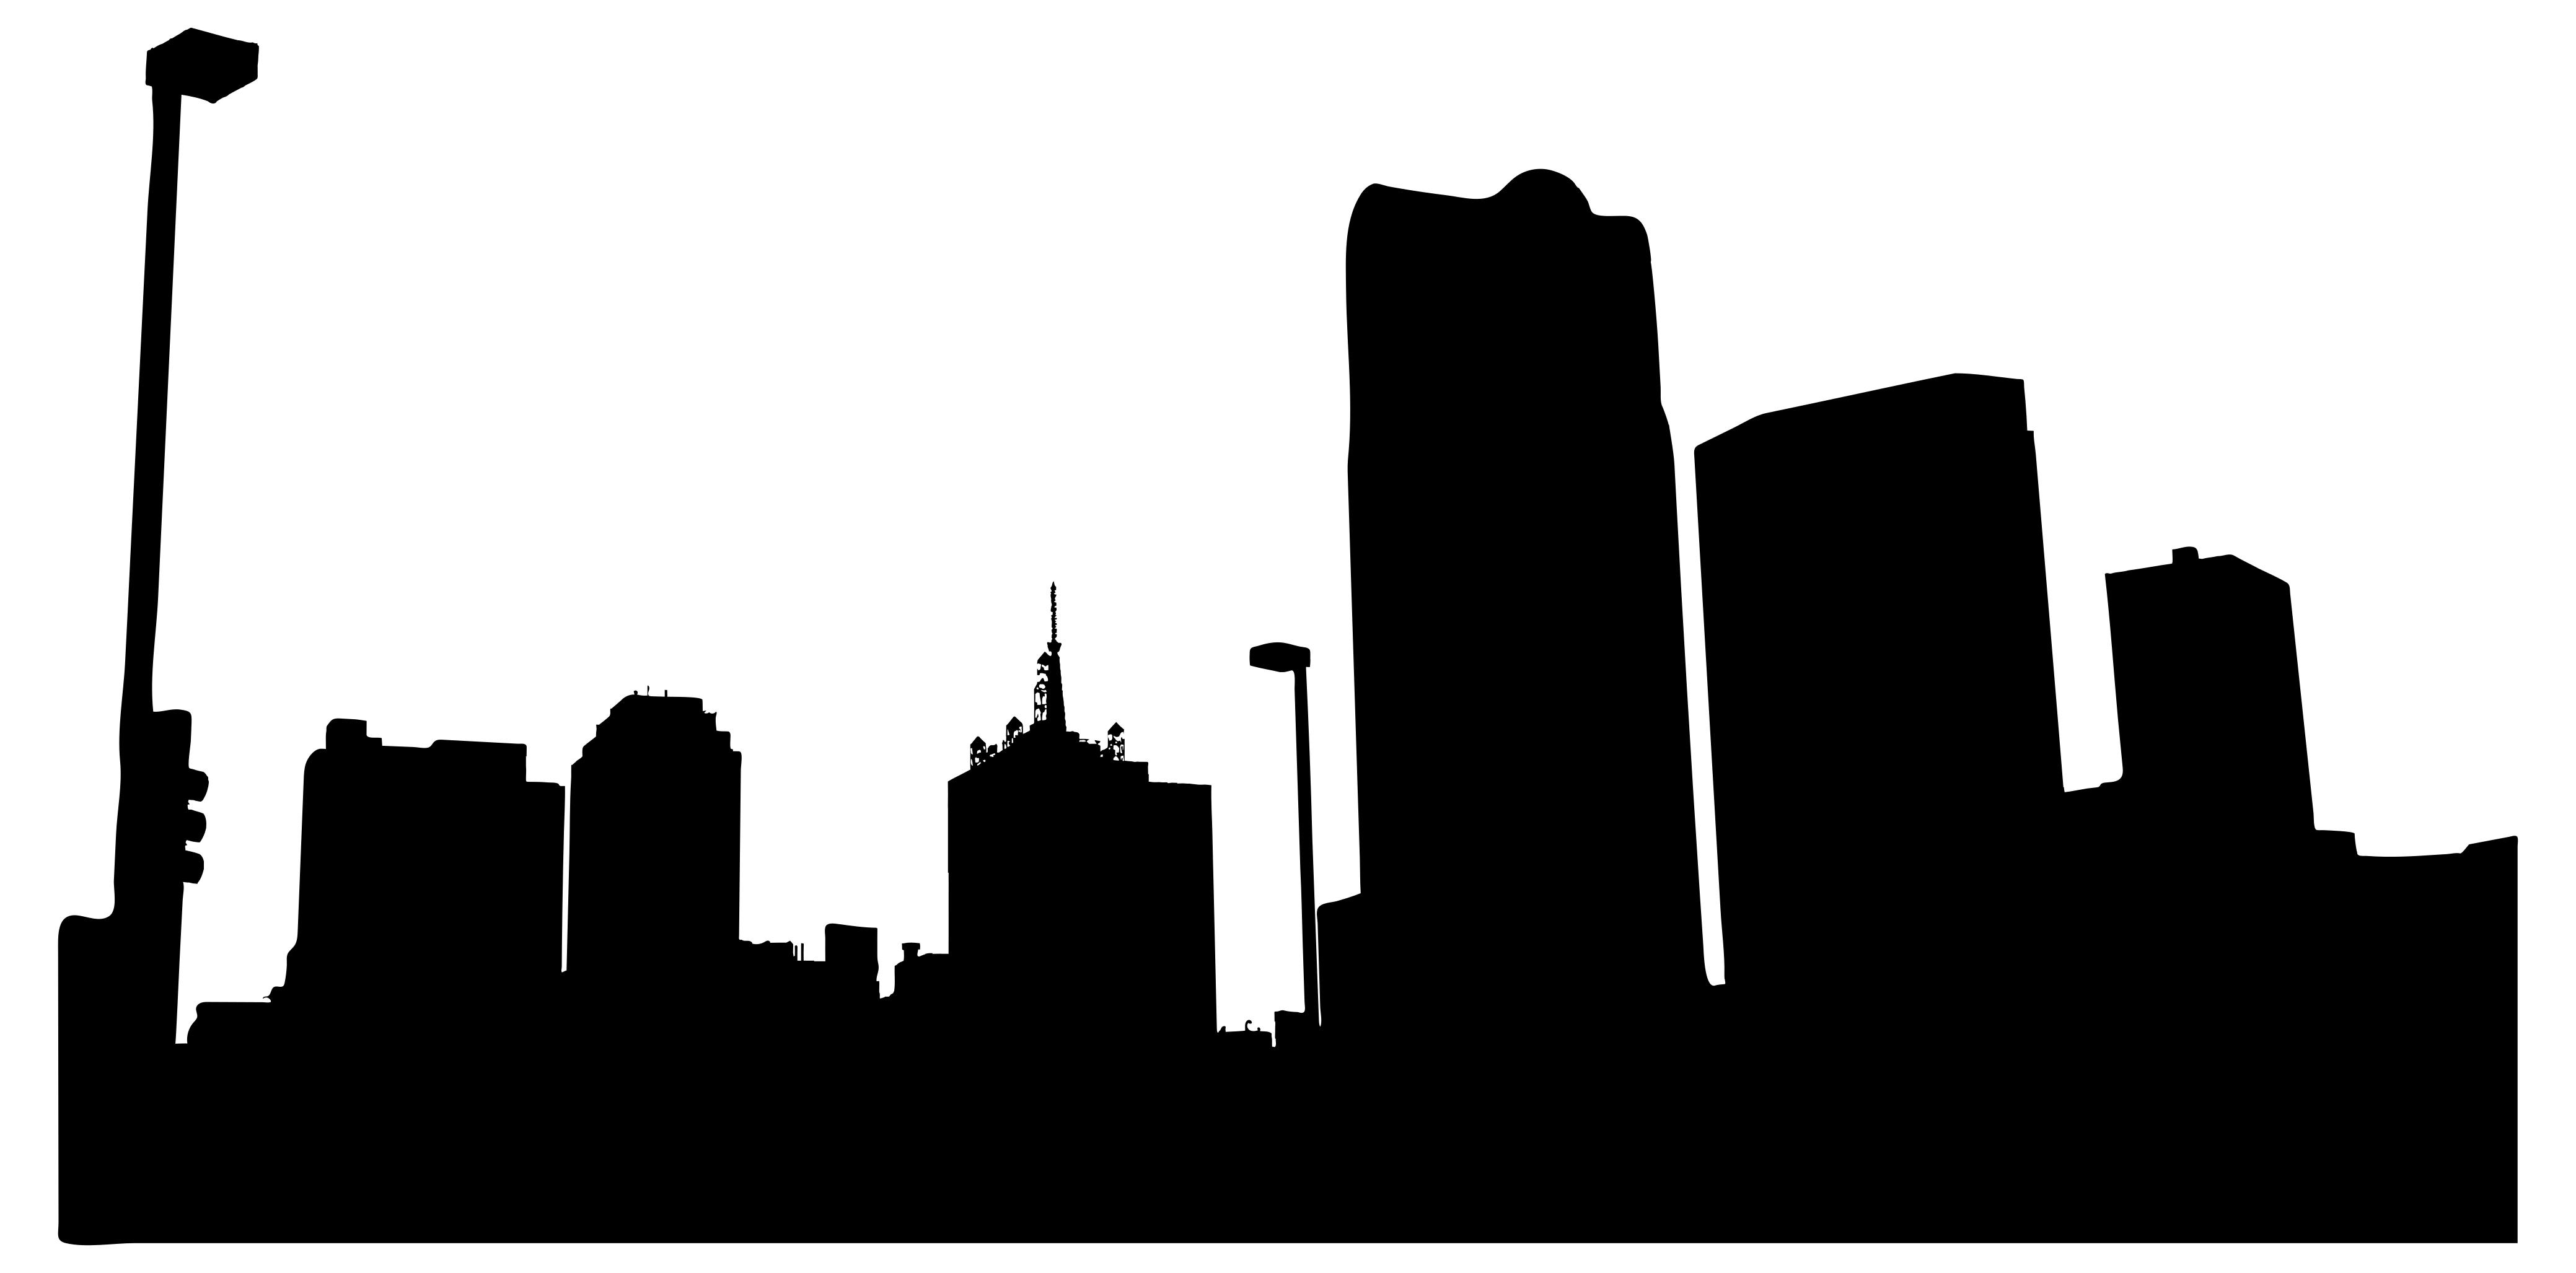 4157x2055 Urban City Silhouette Clipart